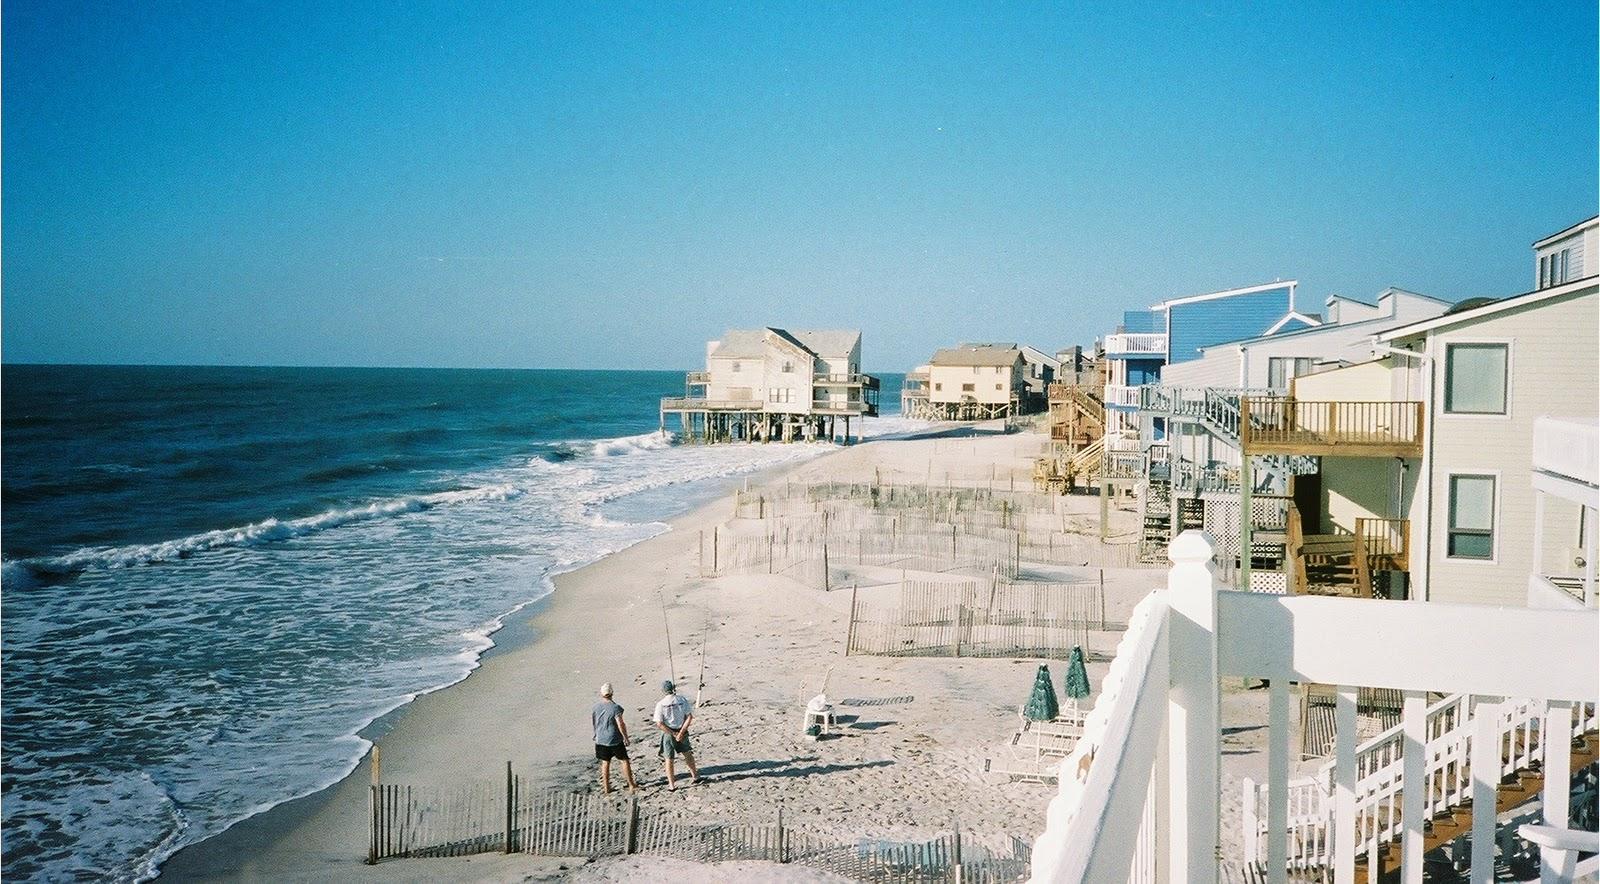 Mannek Photography: The Sites: North Carolina Coast